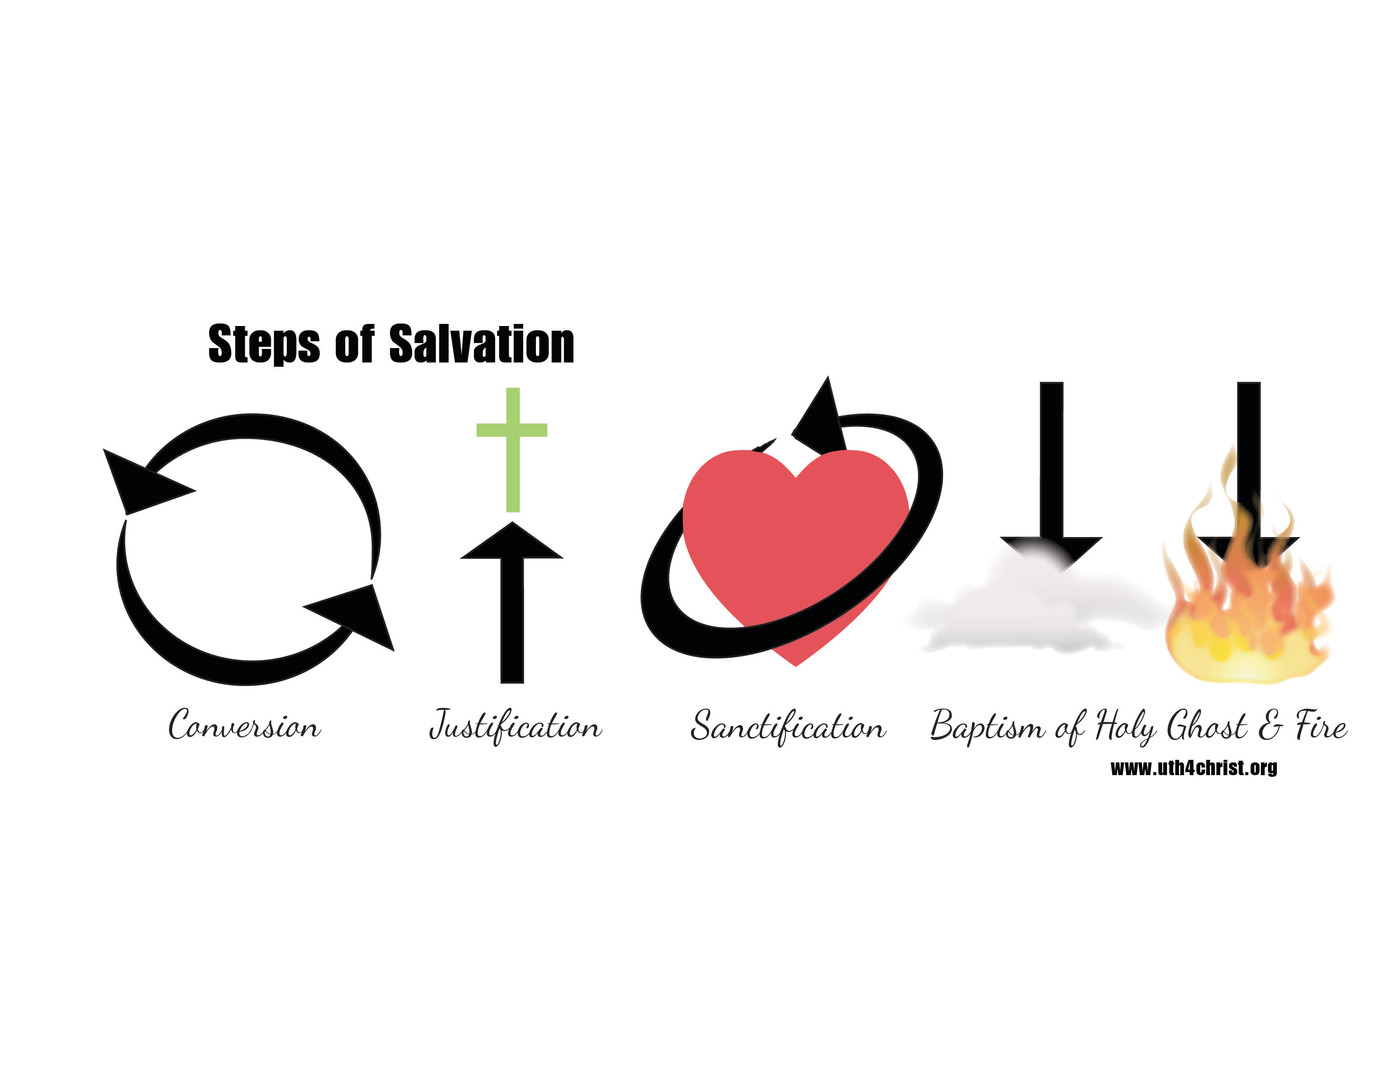 Steps of Salvation